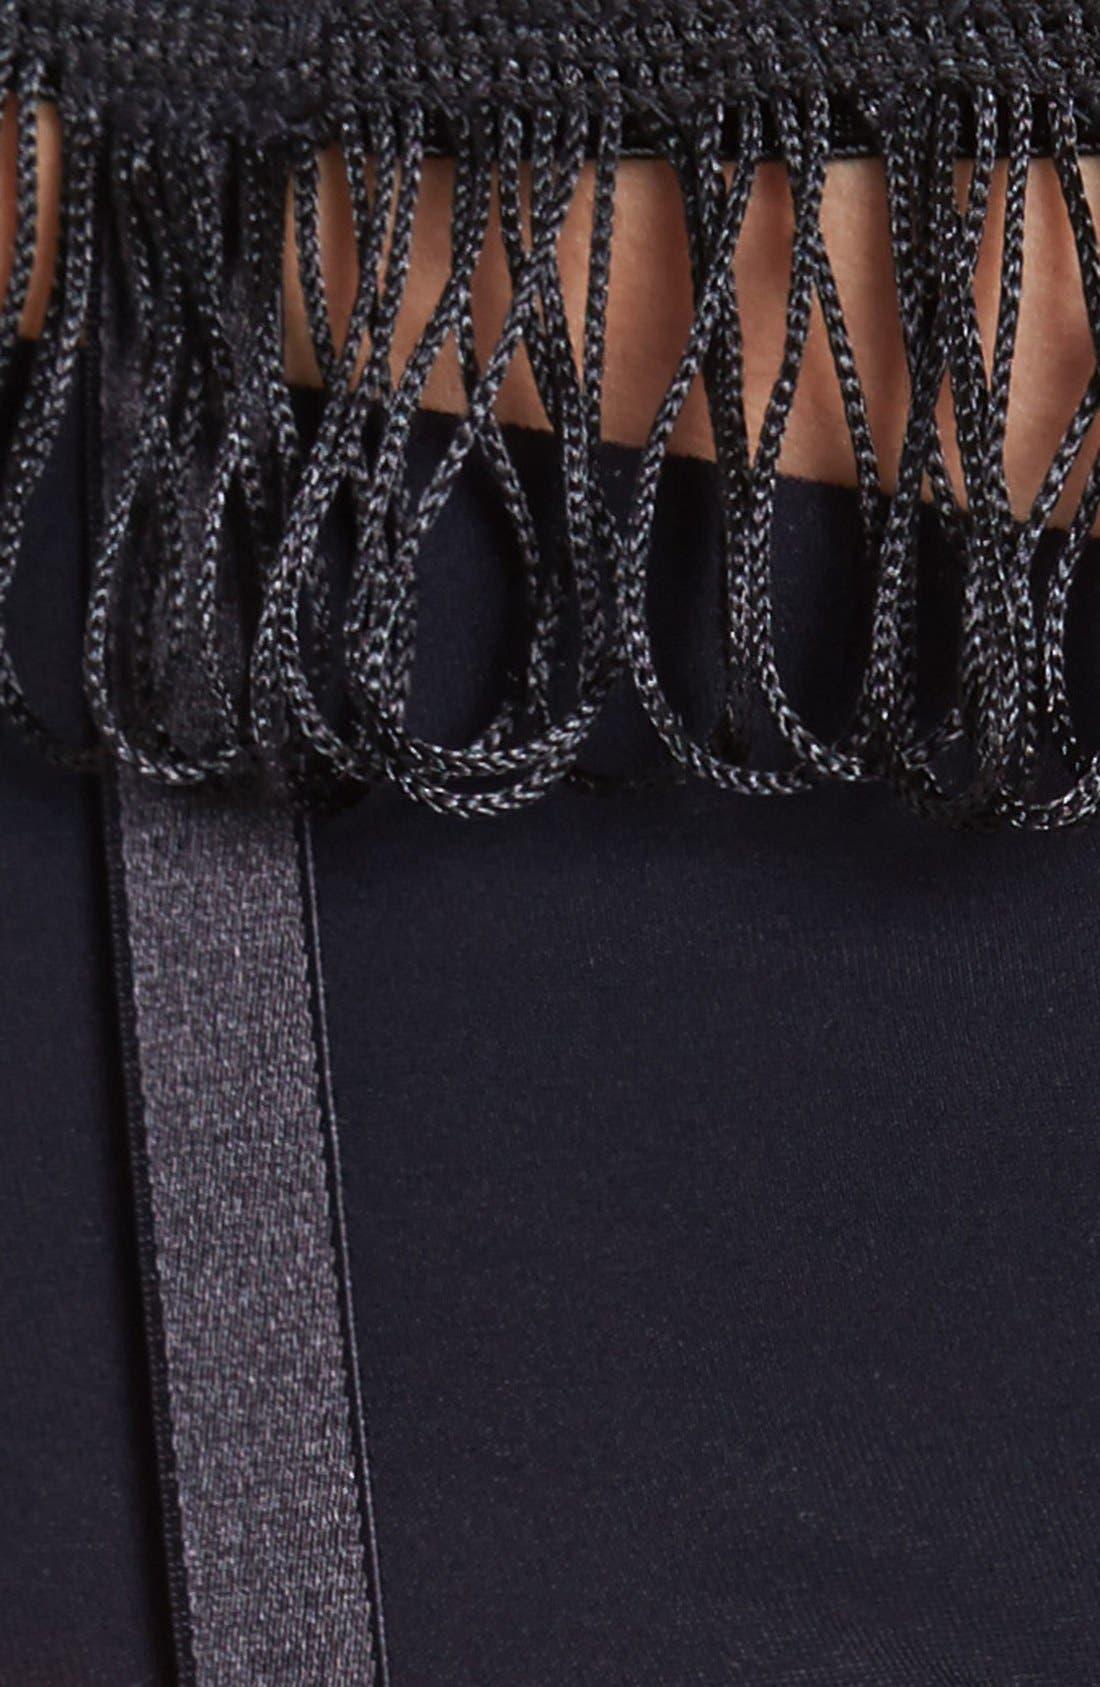 Alternate Image 3  - Hanky Panky 'After Midnight' Fringed Garter Belt